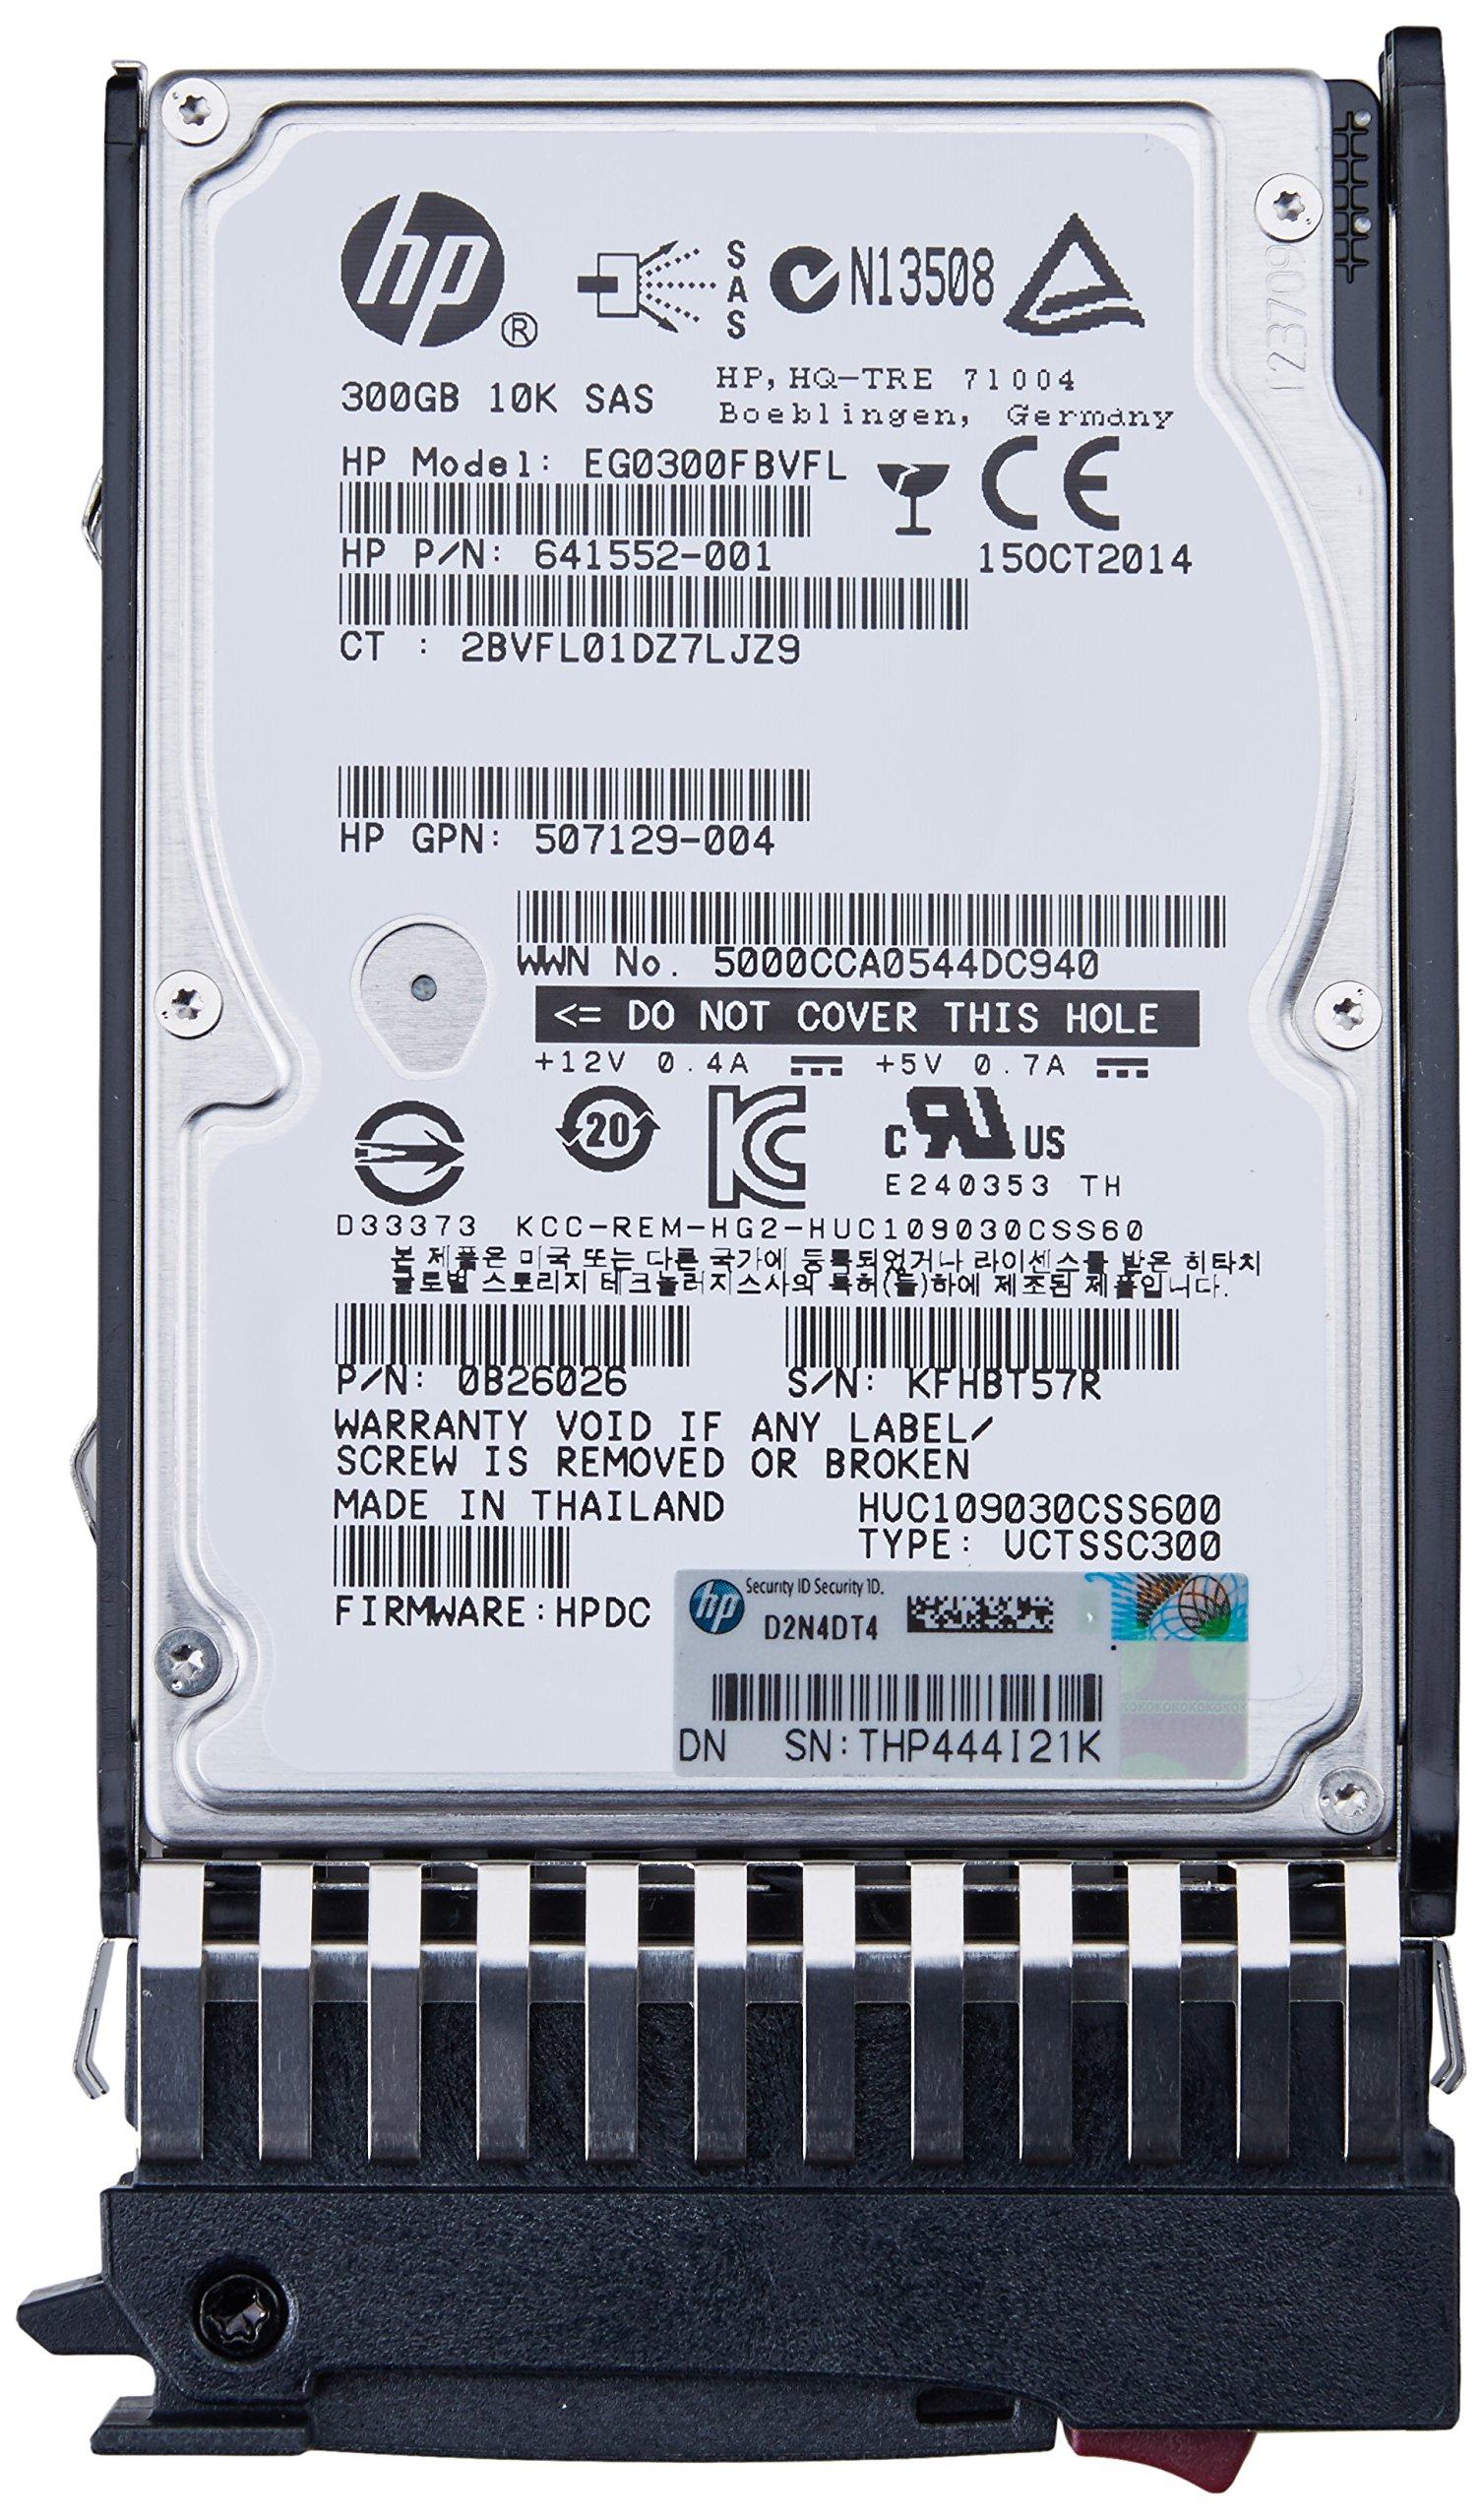 HP 300GB 6G SAS 10K SFF (2.5-inch) Dual Port Enterprise Hard Drive 507127-B21 by HP (Image #2)